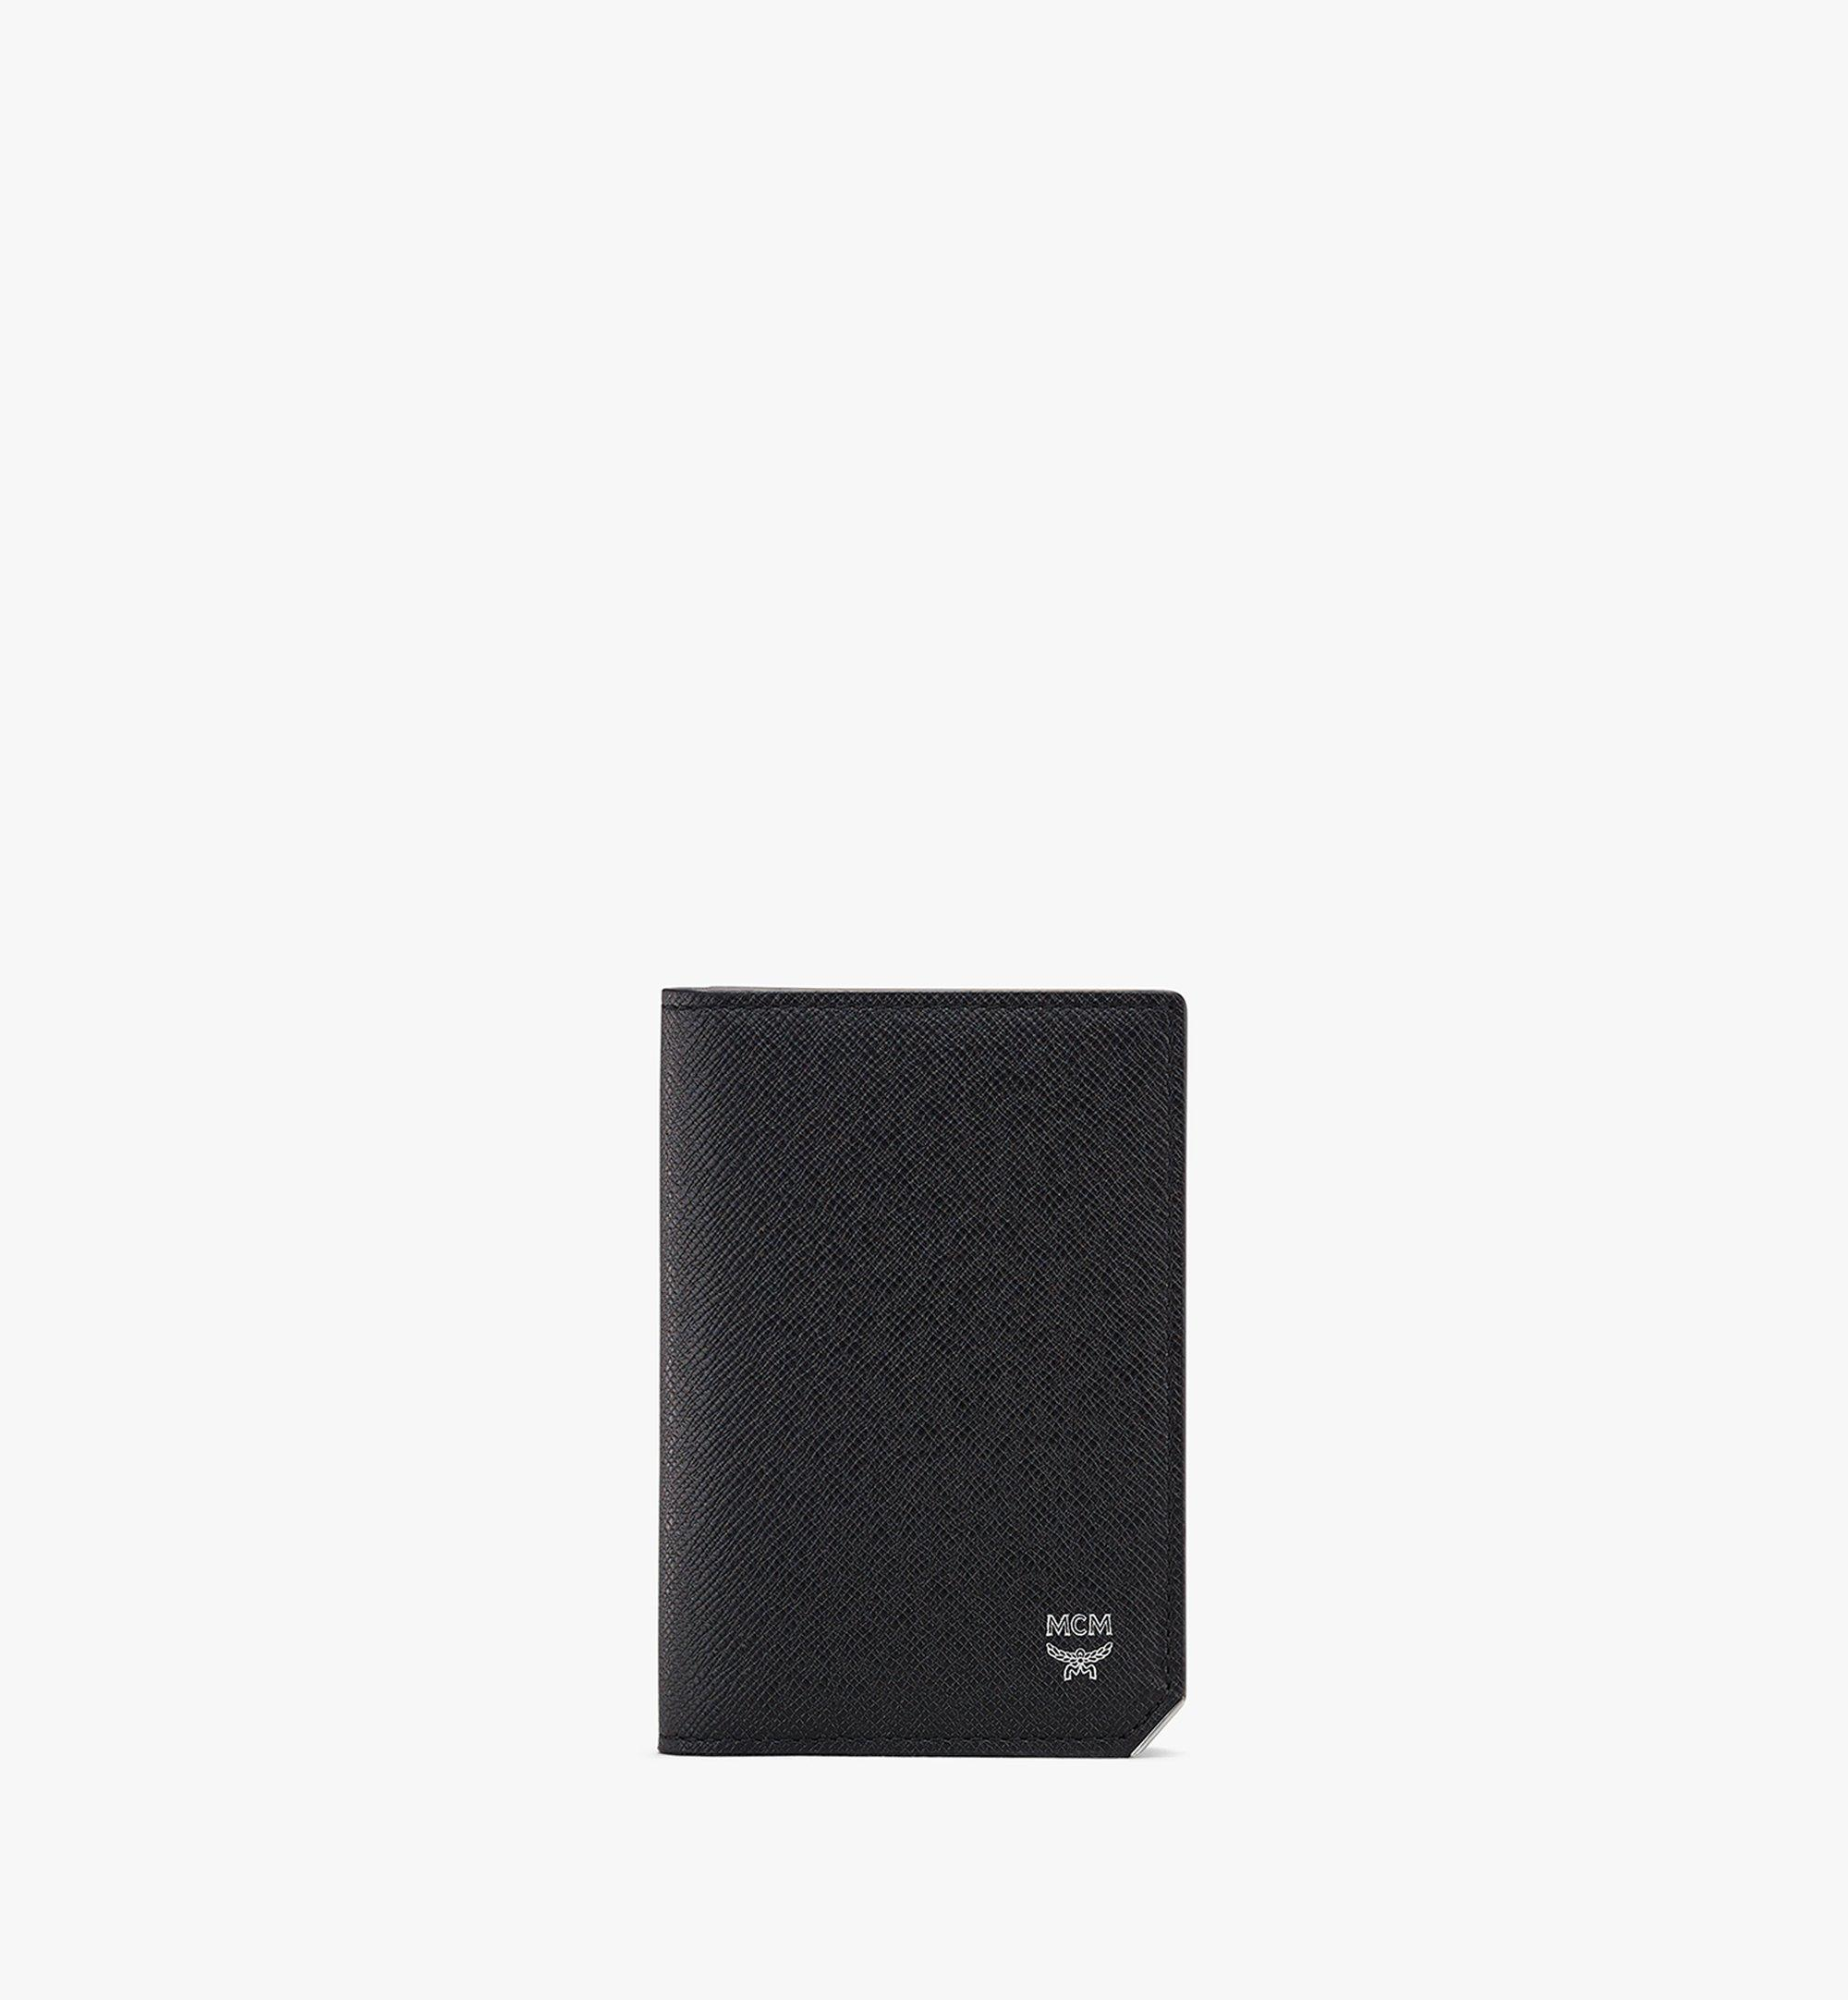 MCM New Bric Bifold Card Wallet Black MXAASLL03BK001 Alternate View 1